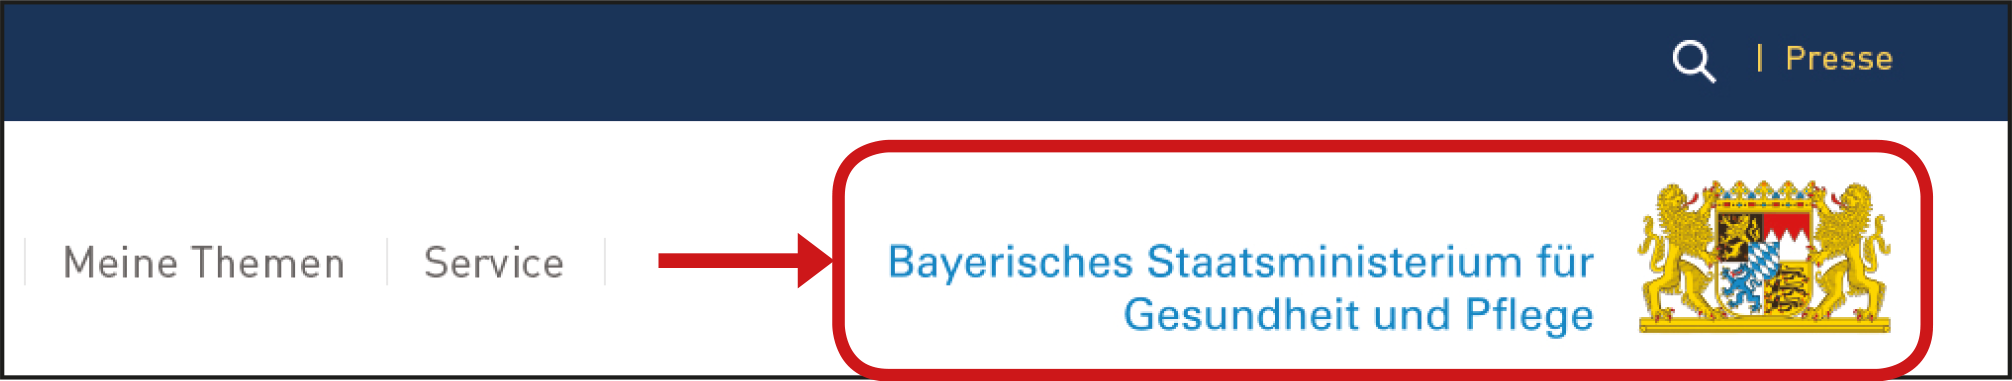 Haupt-Menü Wappen.